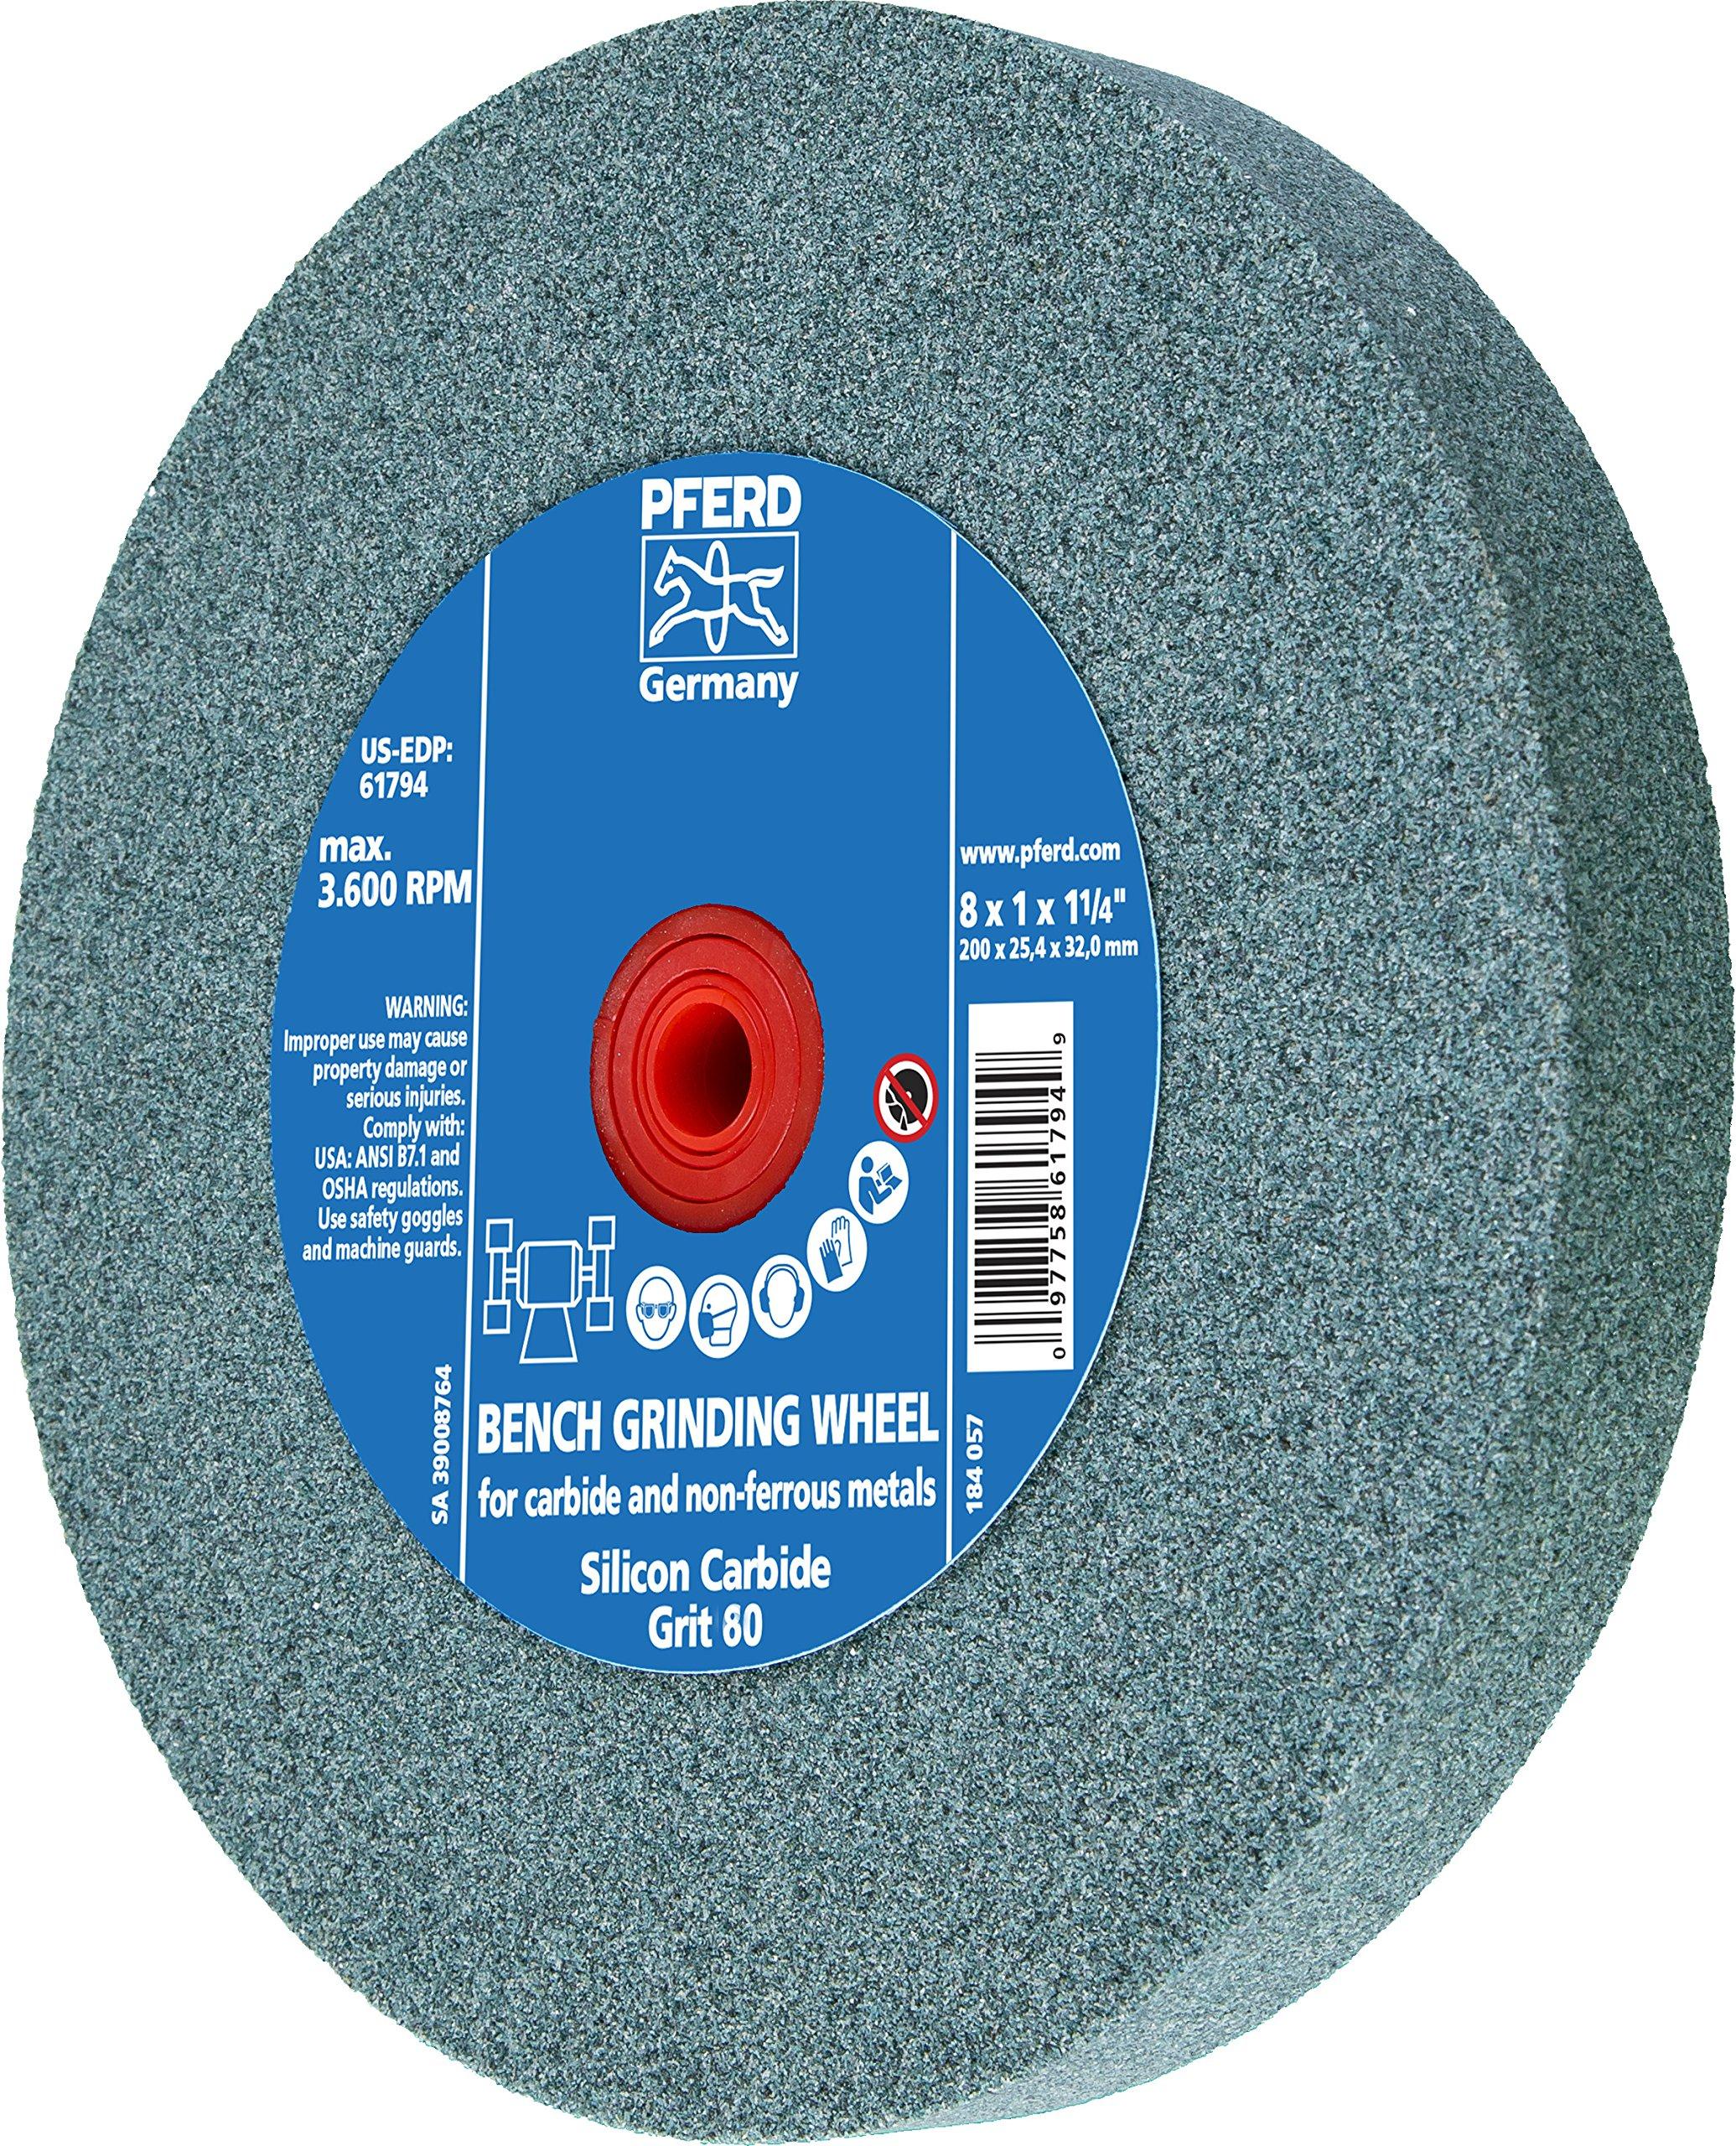 PFERD 61795 Bench Grinding Wheel, Silicon Carbide, 8'' Diameter, 1'' Thick, 1-1/4'' Arbor Hole, 80 Grit, 3600 Maximum RPM by Pferd